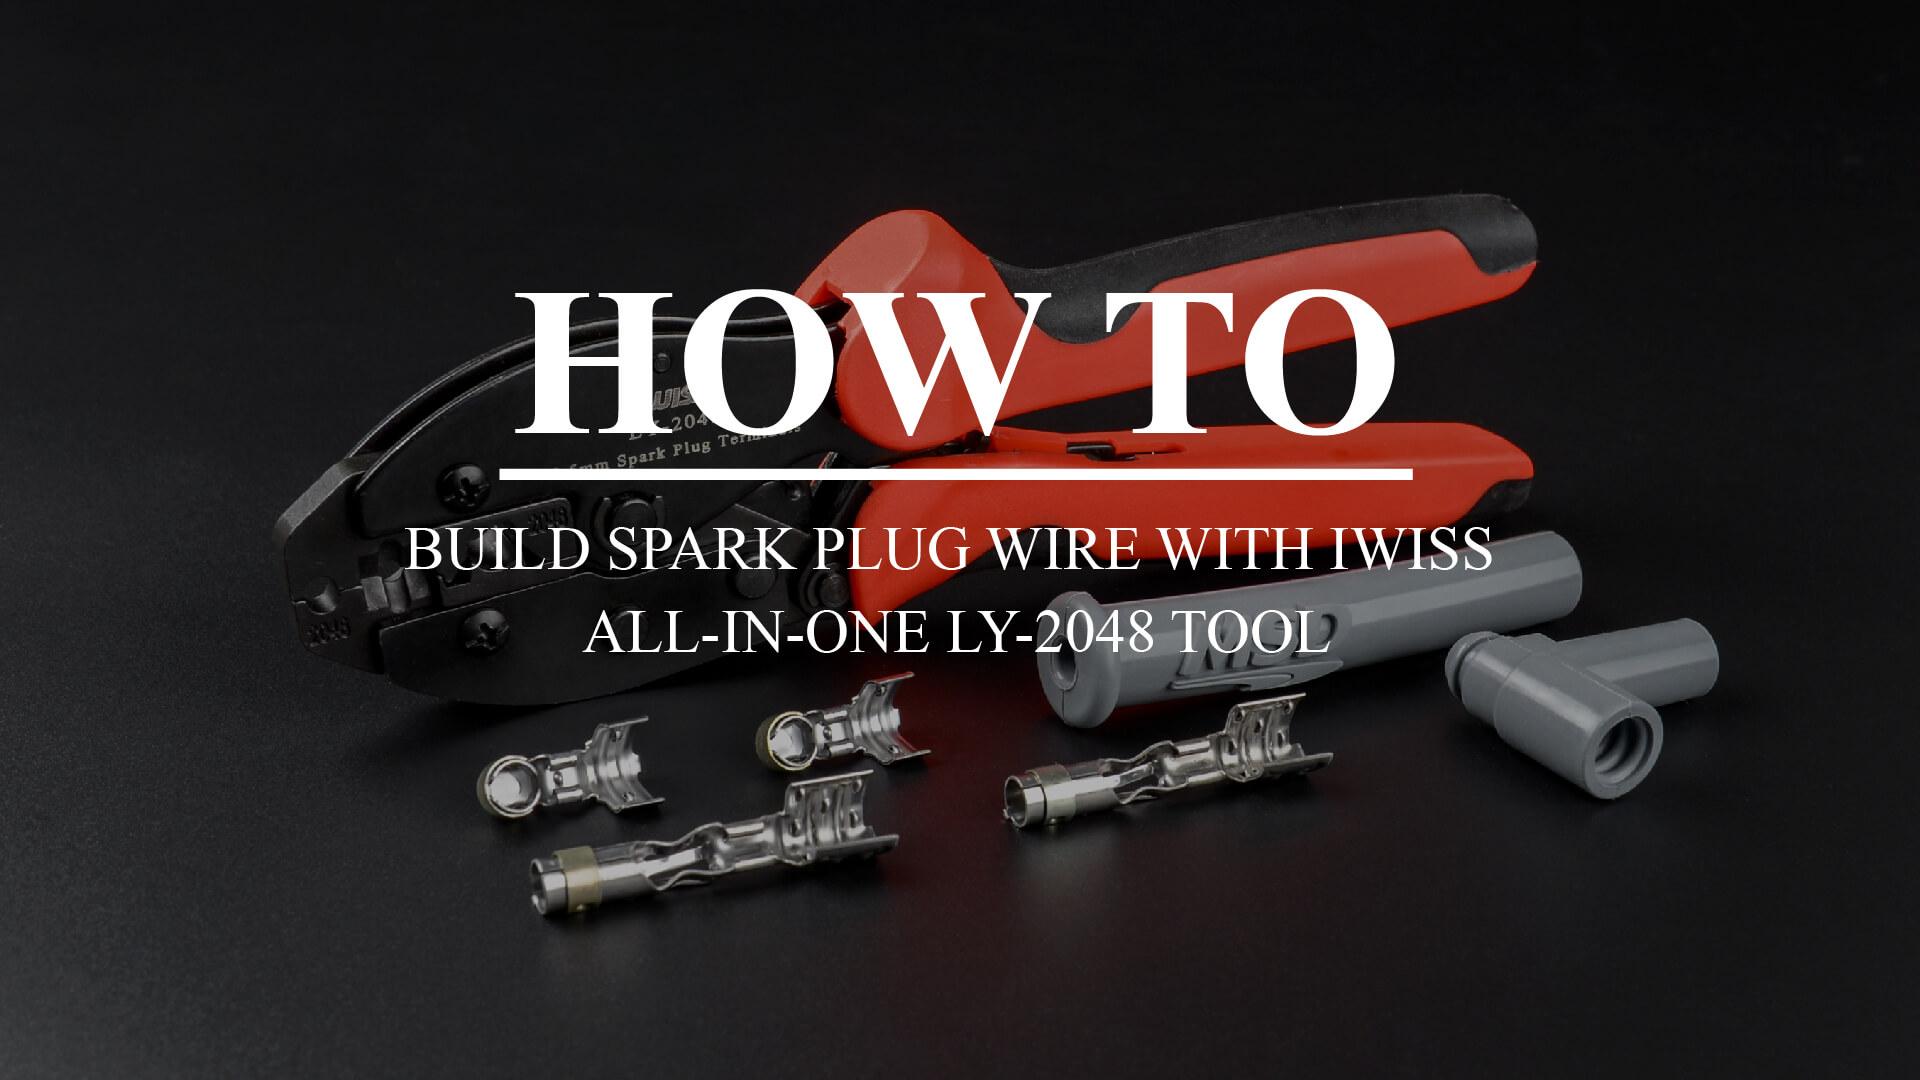 IWISS Ratchet Spark Plug Wire Crimper for Spark Plug Ignition Wire